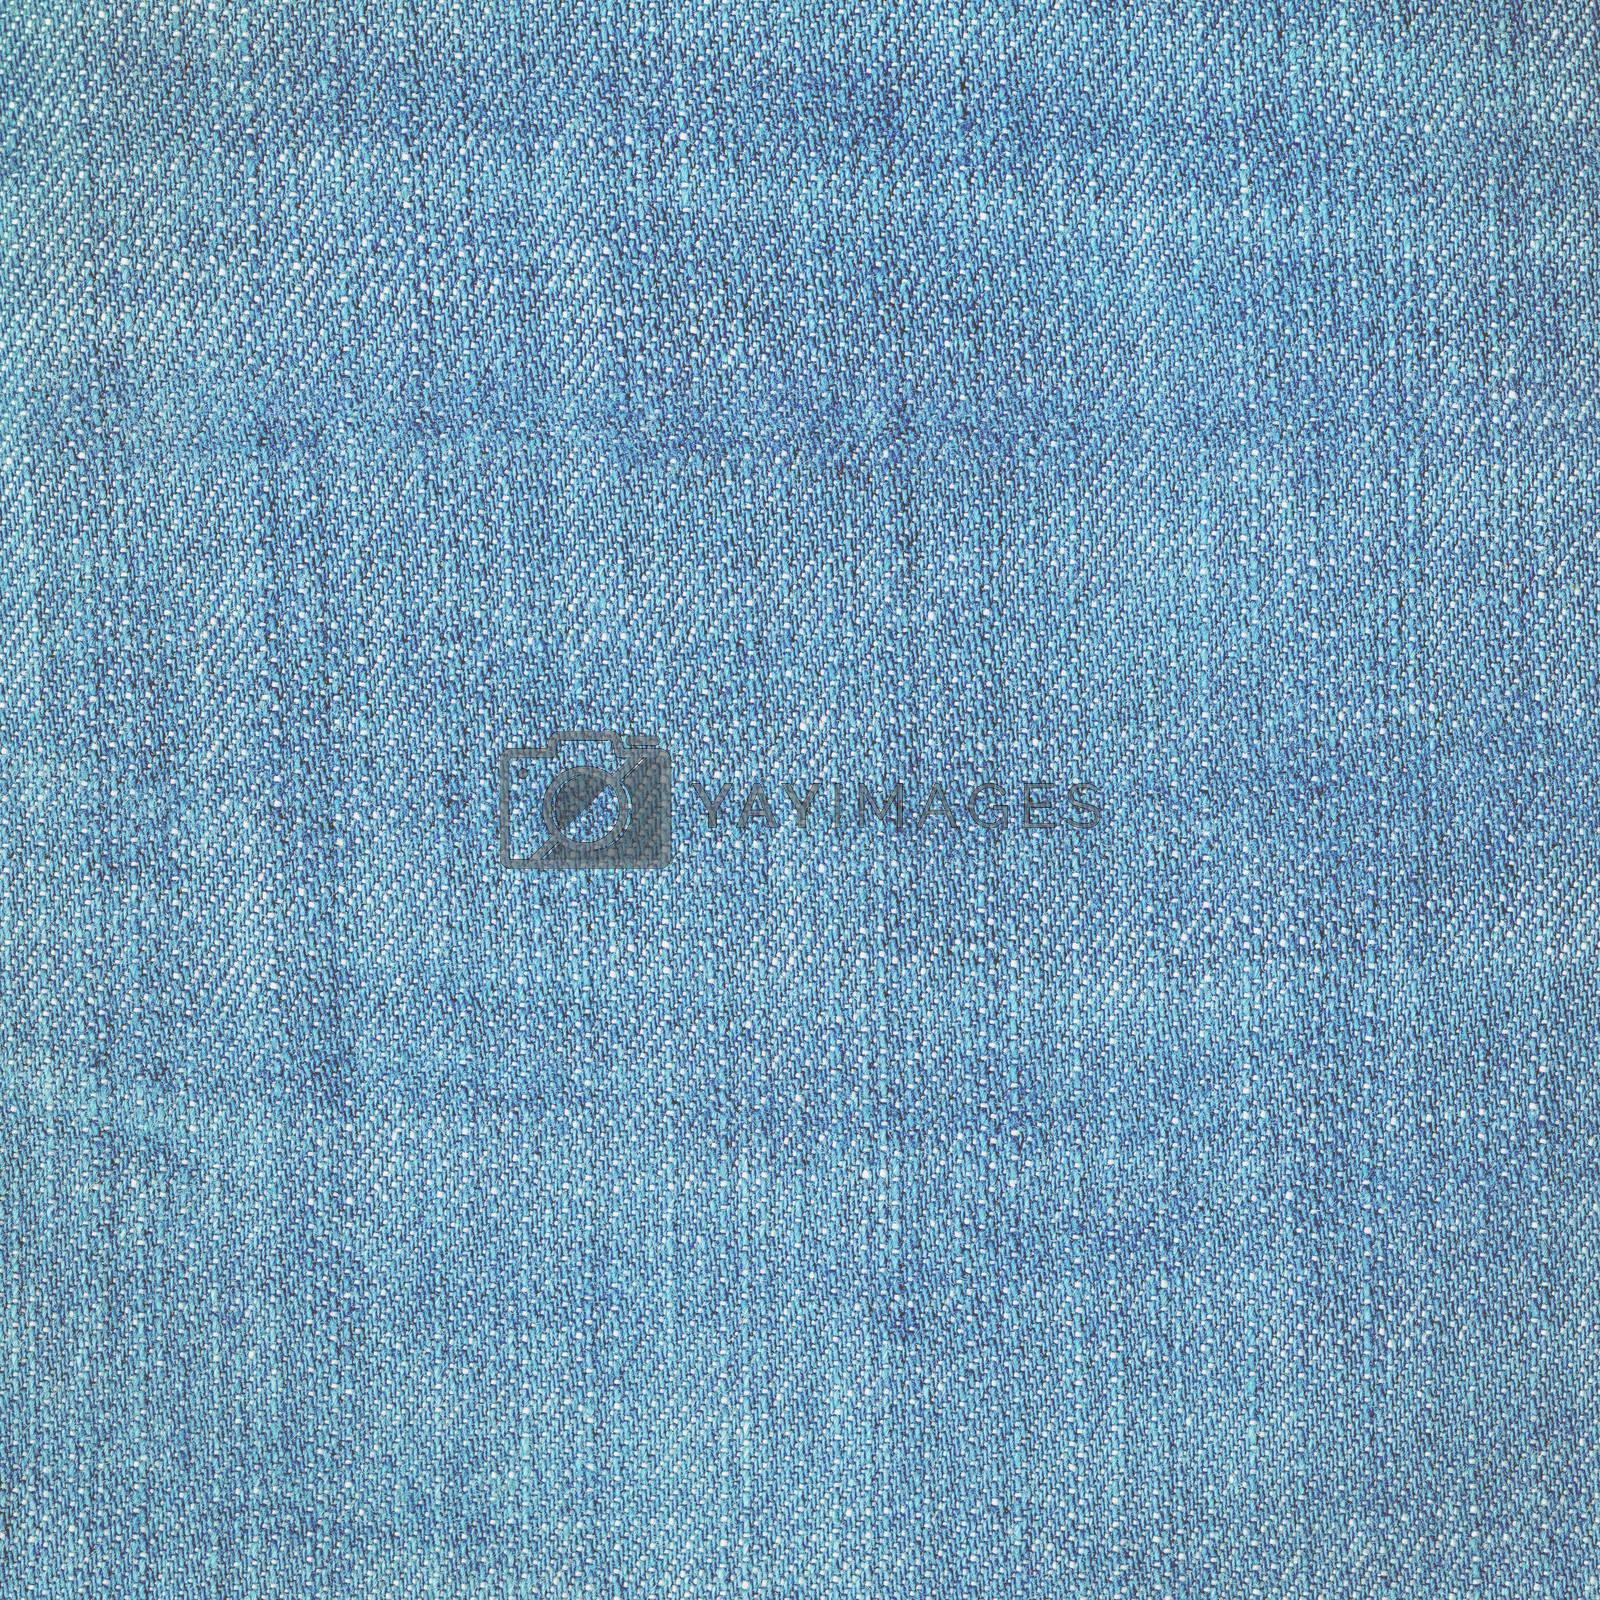 Denim Texture, Light Blue Jeans Background